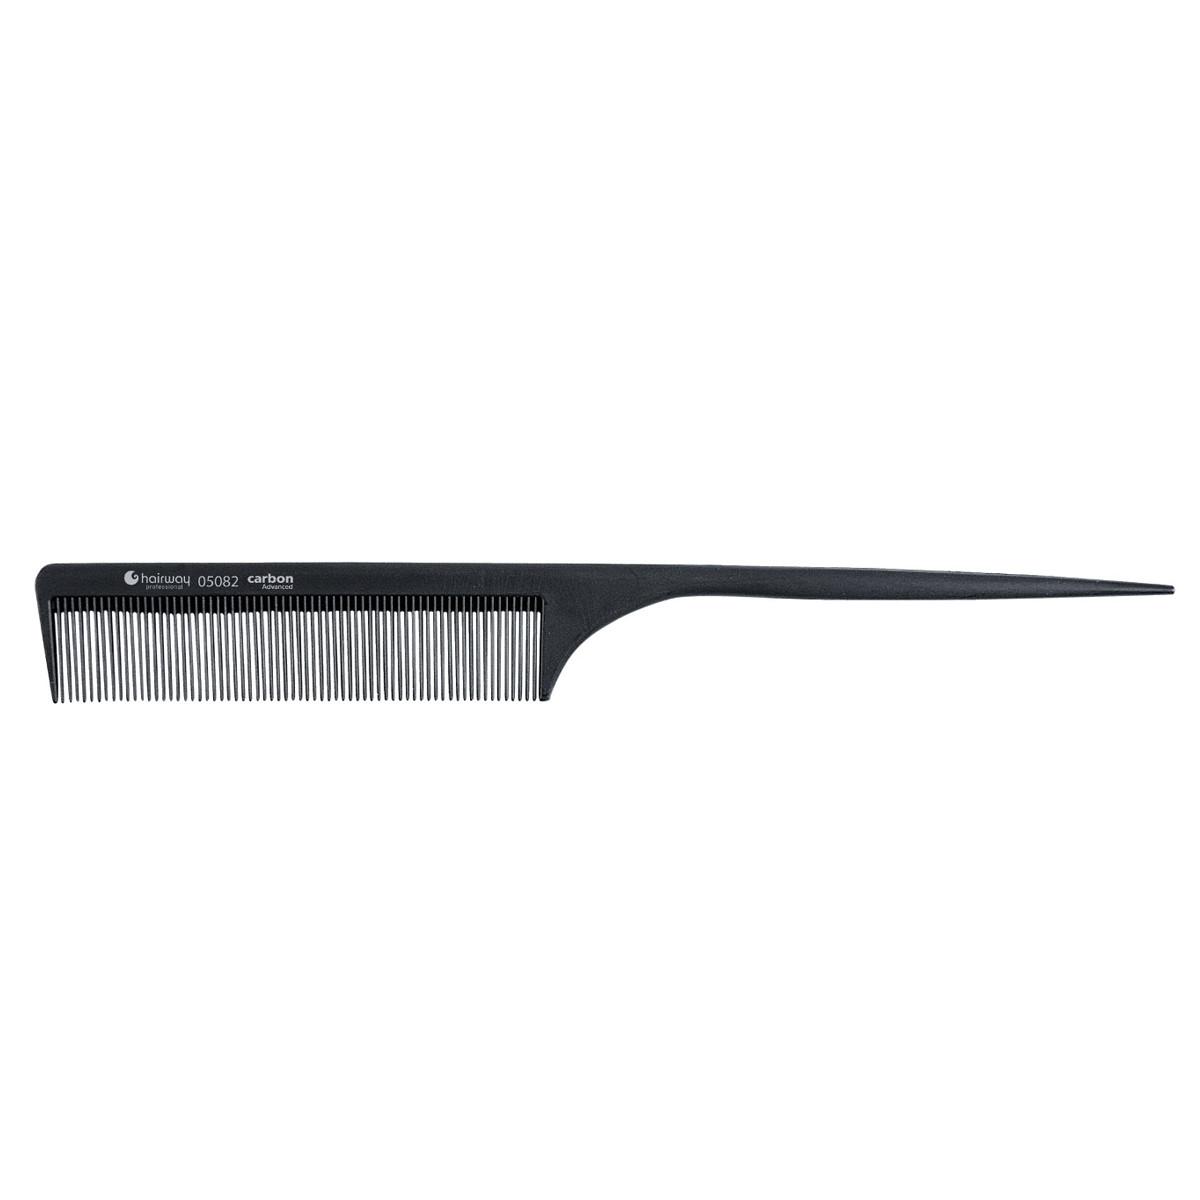 Гребень Hairway 05082 карбоновый гипоаллергенный 220 мм